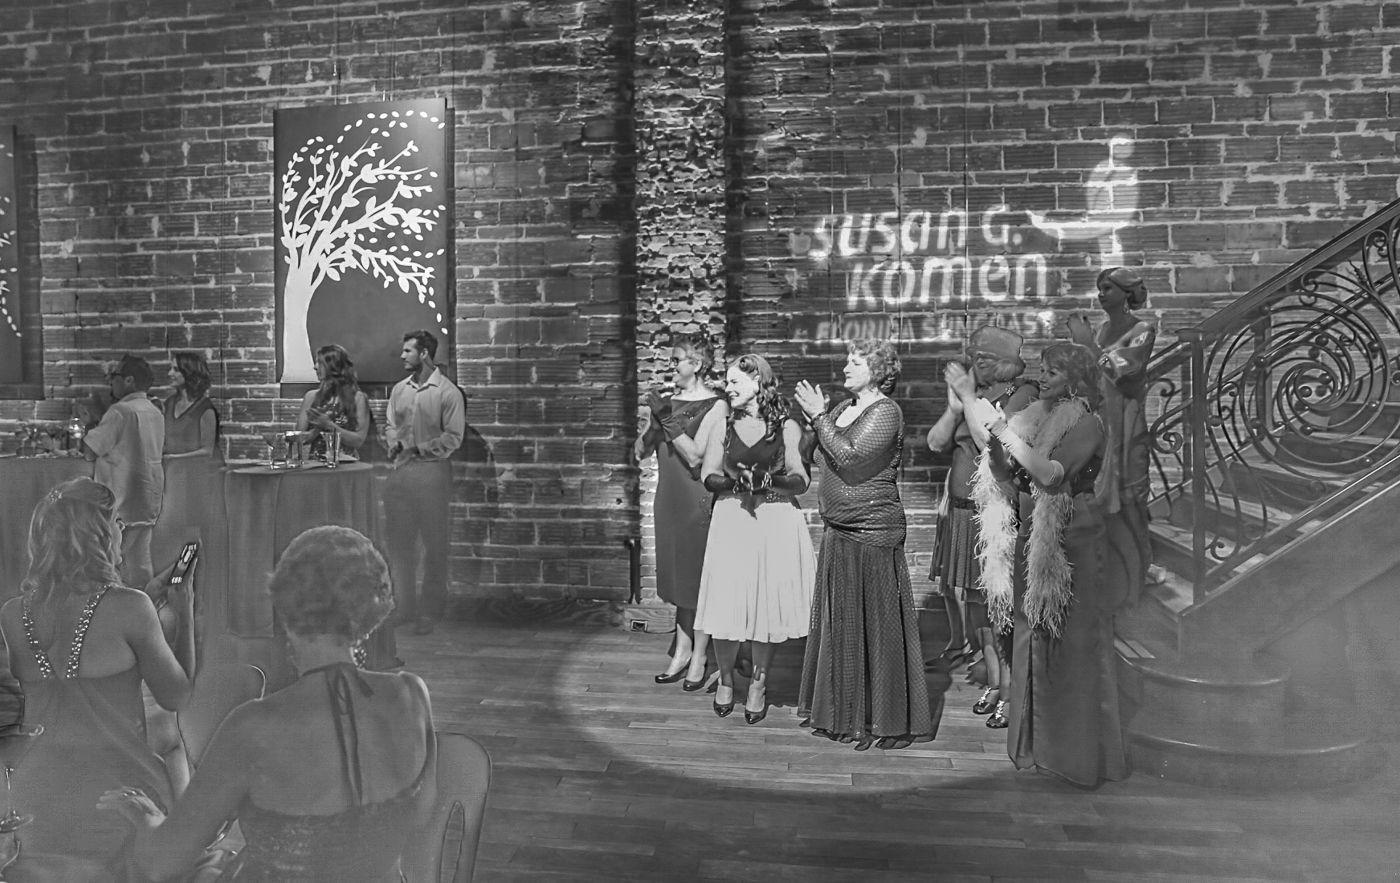 Susan G. Komen fundraiser at NOVA 535 downtown St. Petersburg, Florida